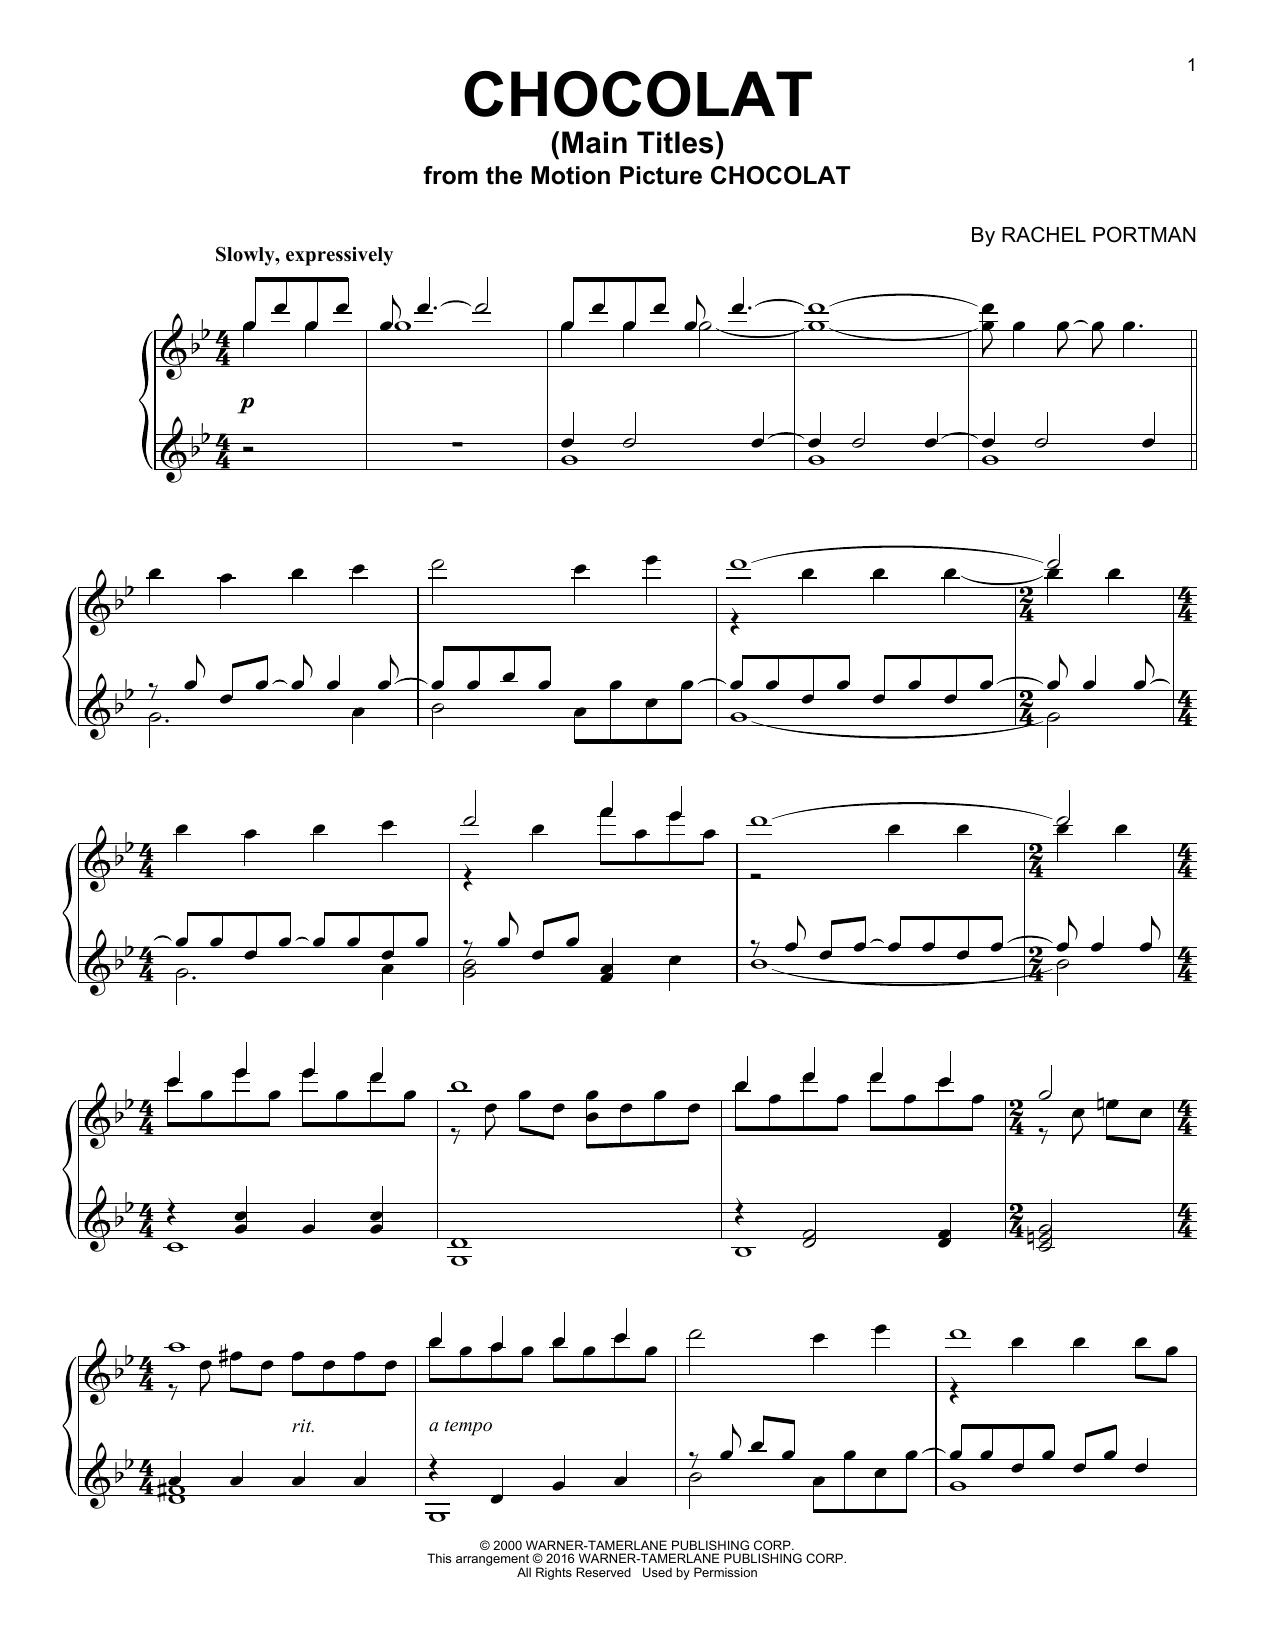 Rachel Portman Chocolat (Main Titles) sheet music notes and chords